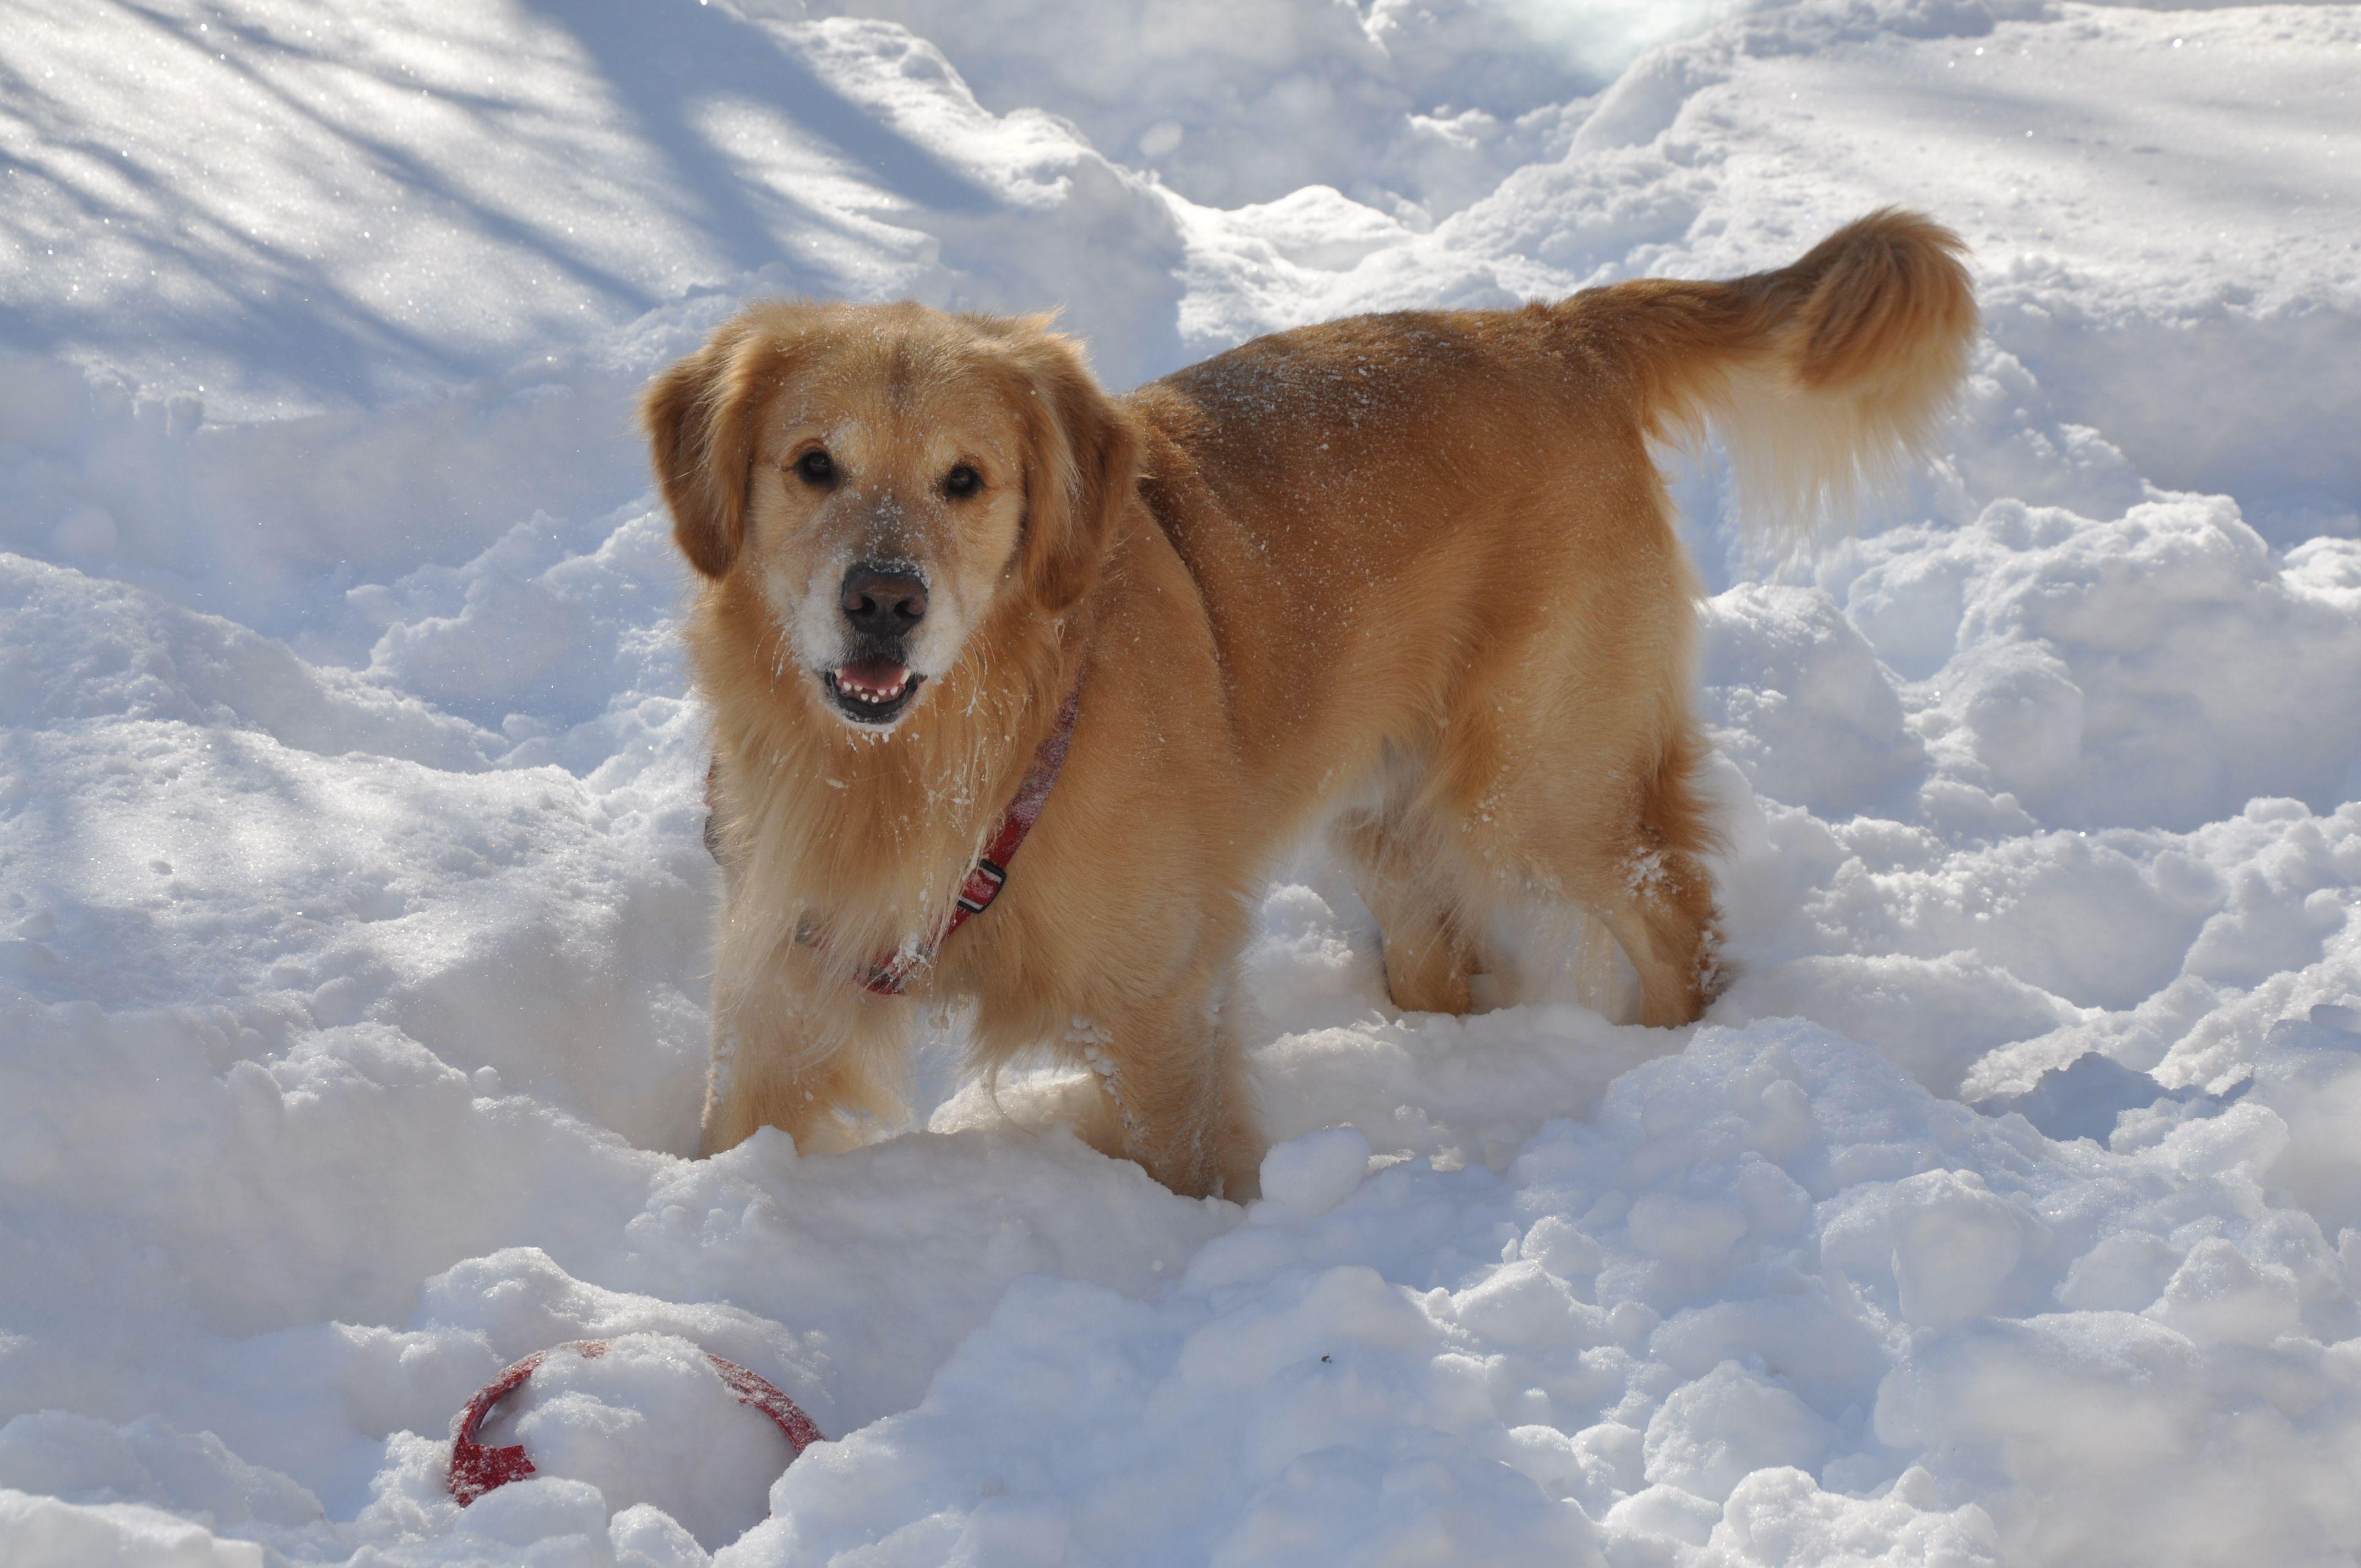 Golden retriever in snow